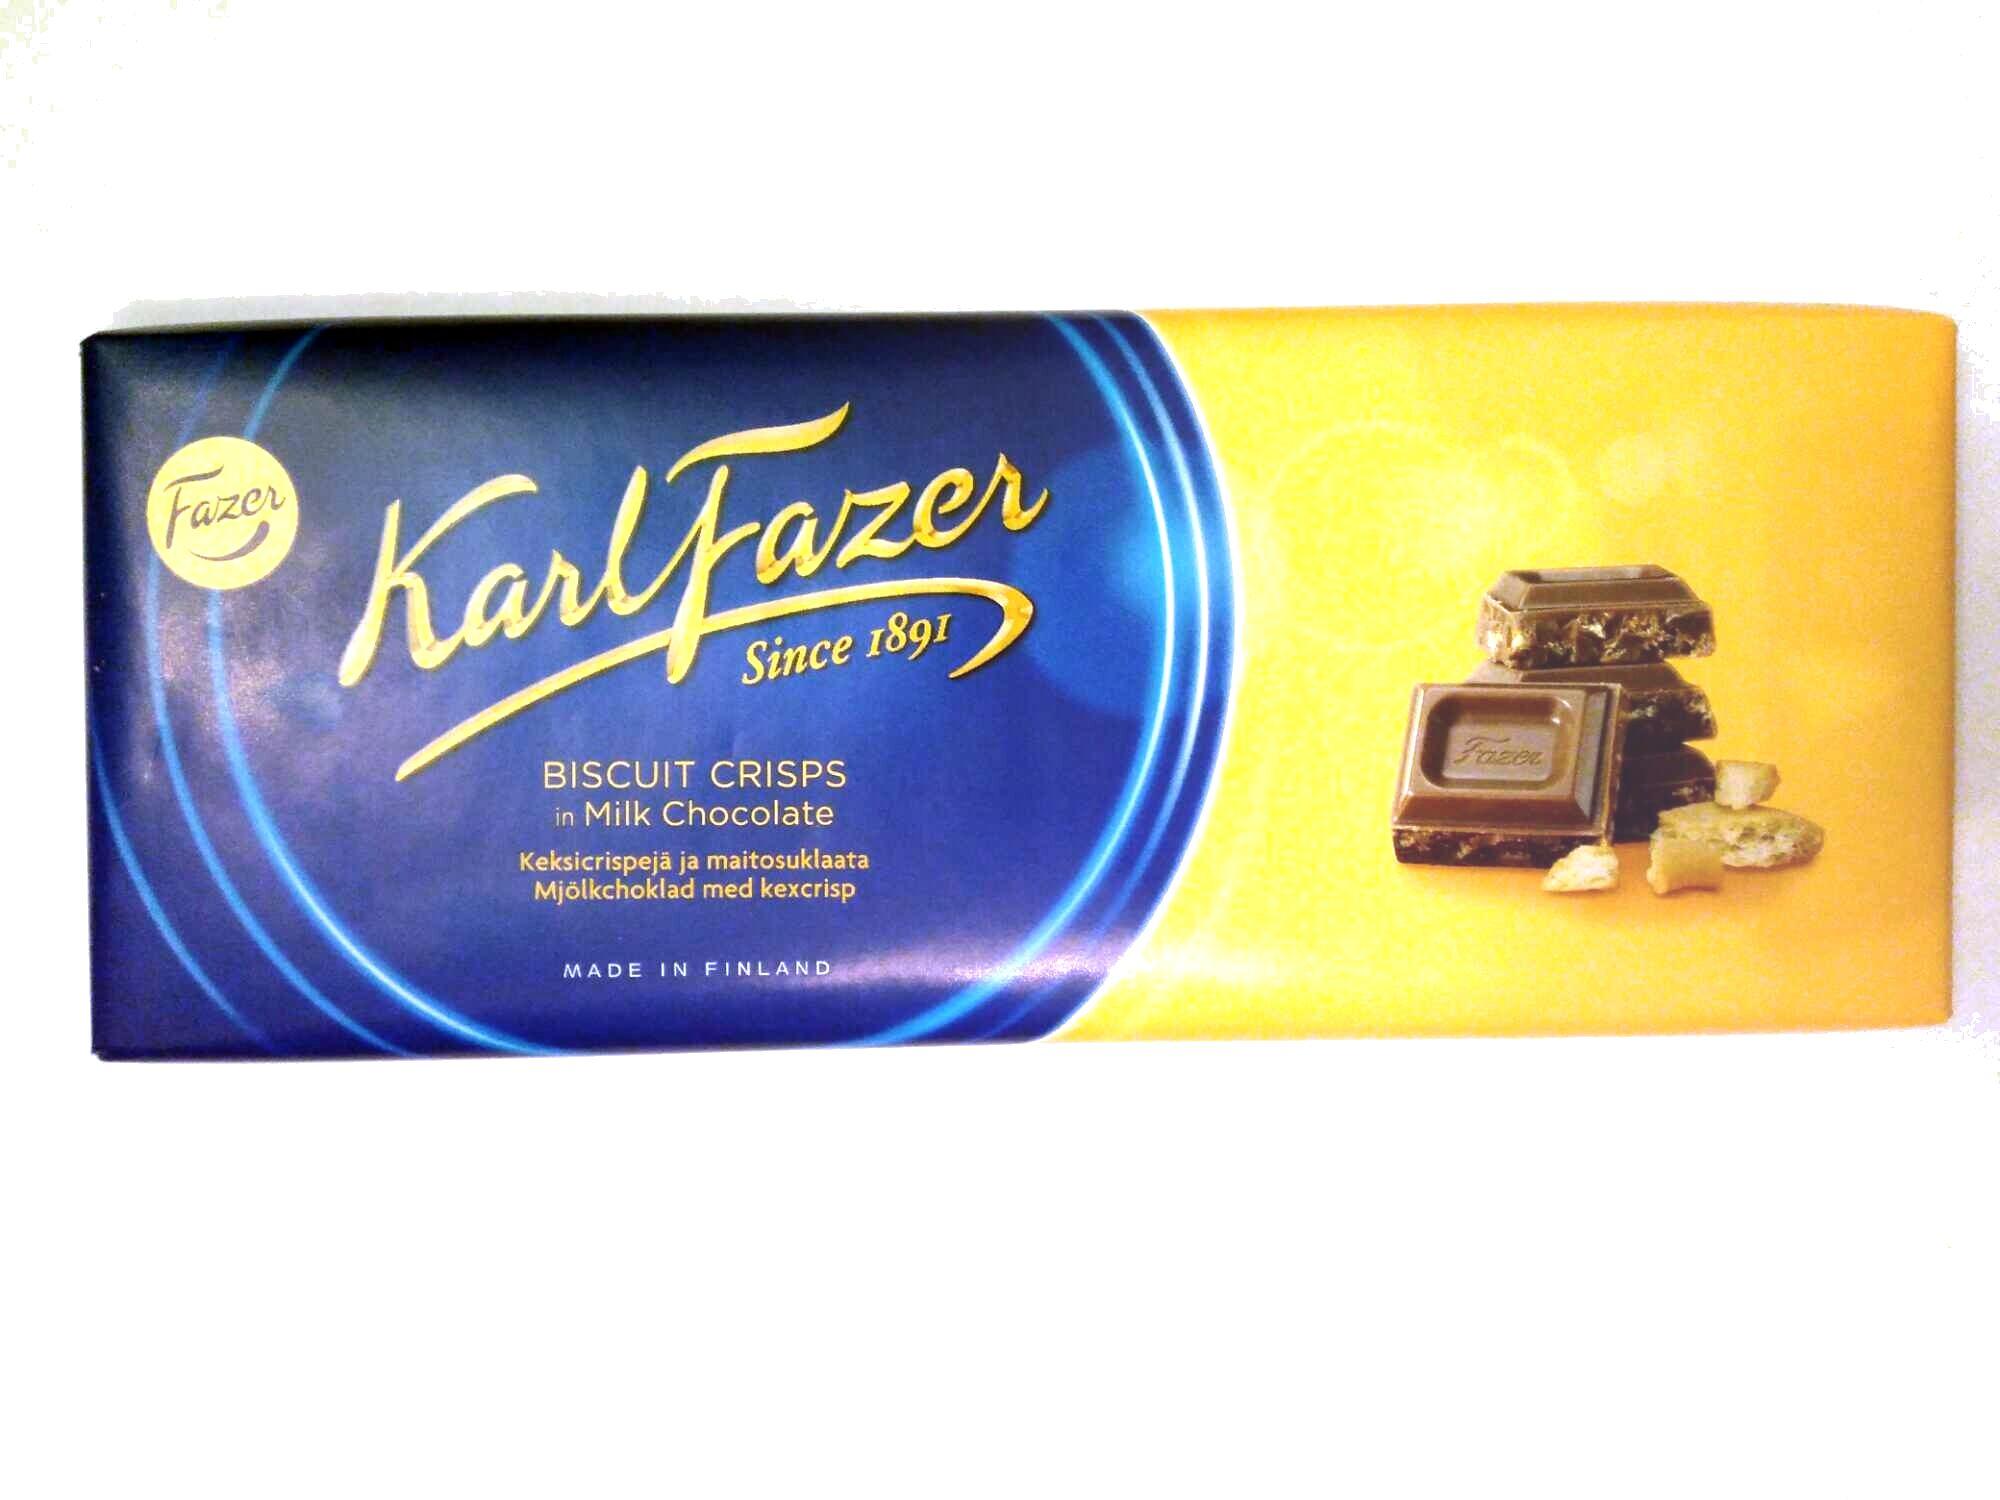 Karl Fazer keksicrispejä ja maitosuklaata - Продукт - fi